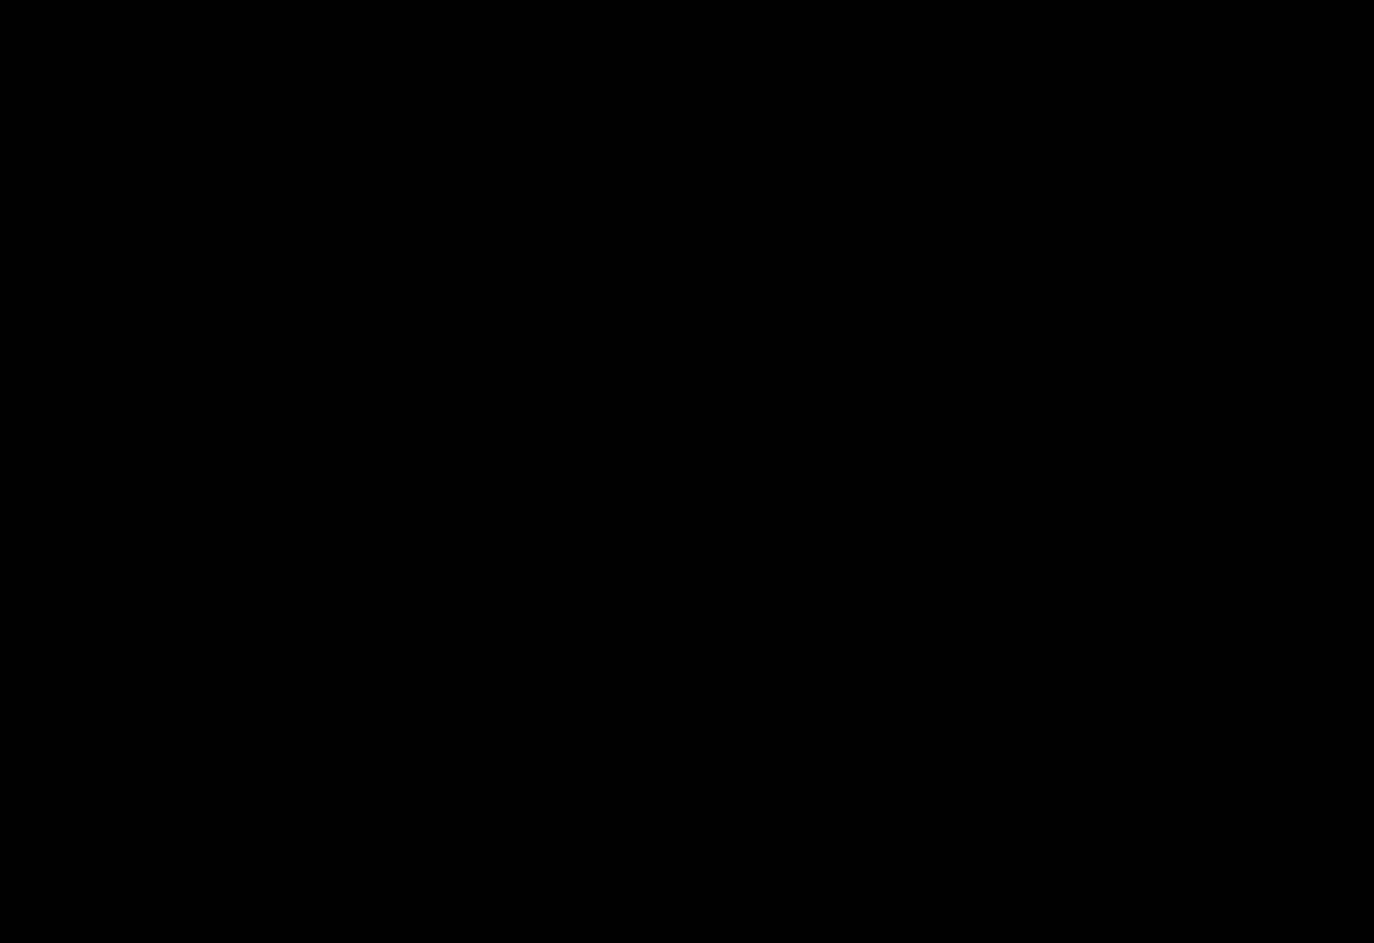 Amino-dPEG®₄-(m-dPEG®₁₁)₃